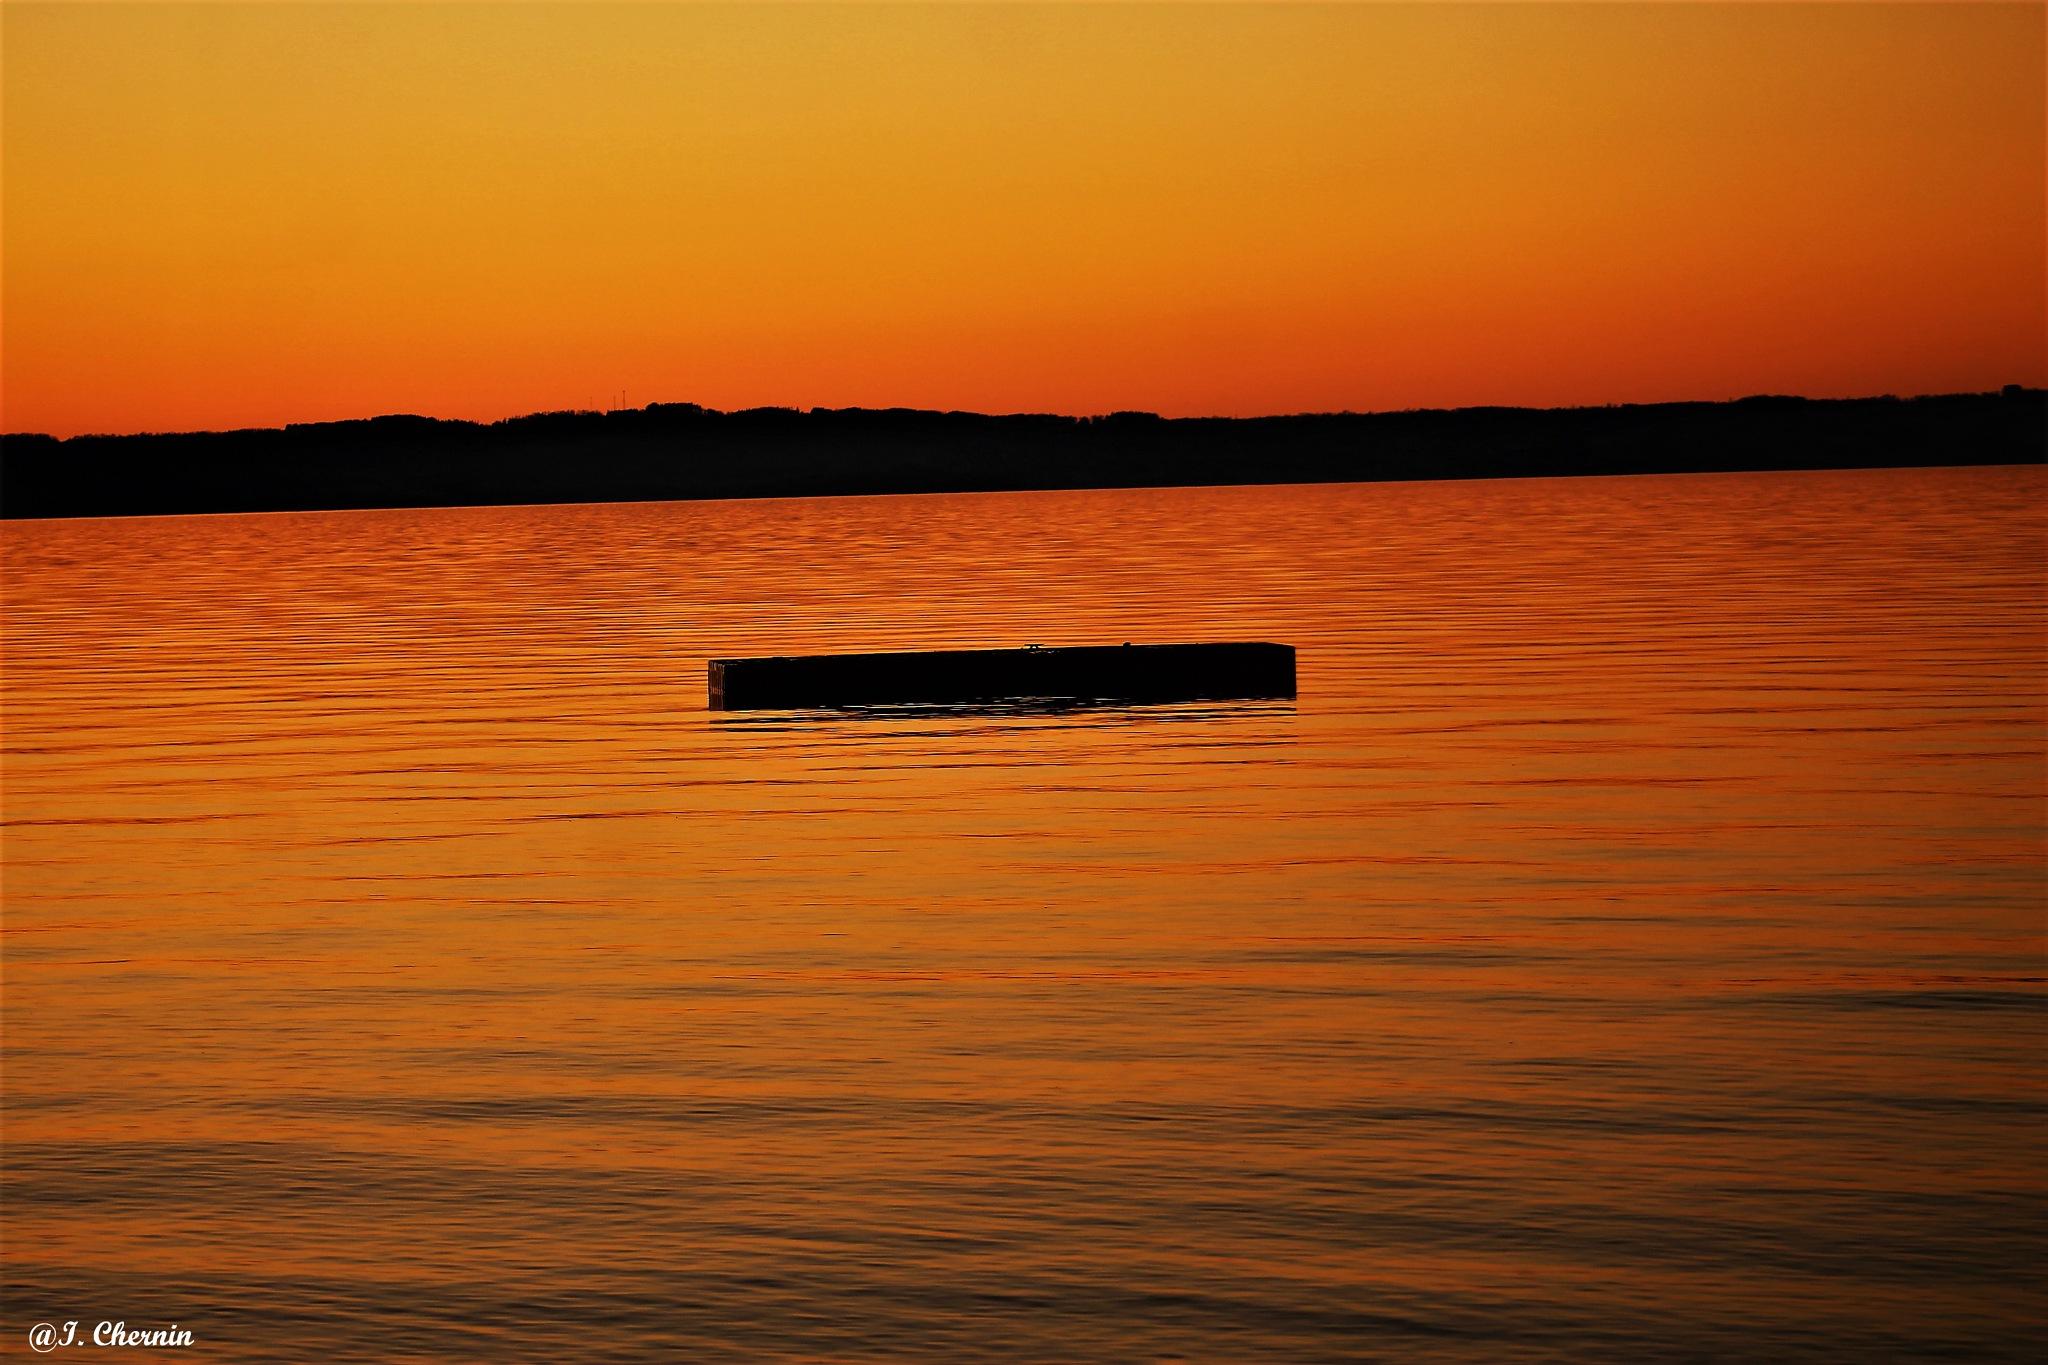 calm at sunset by ichernin